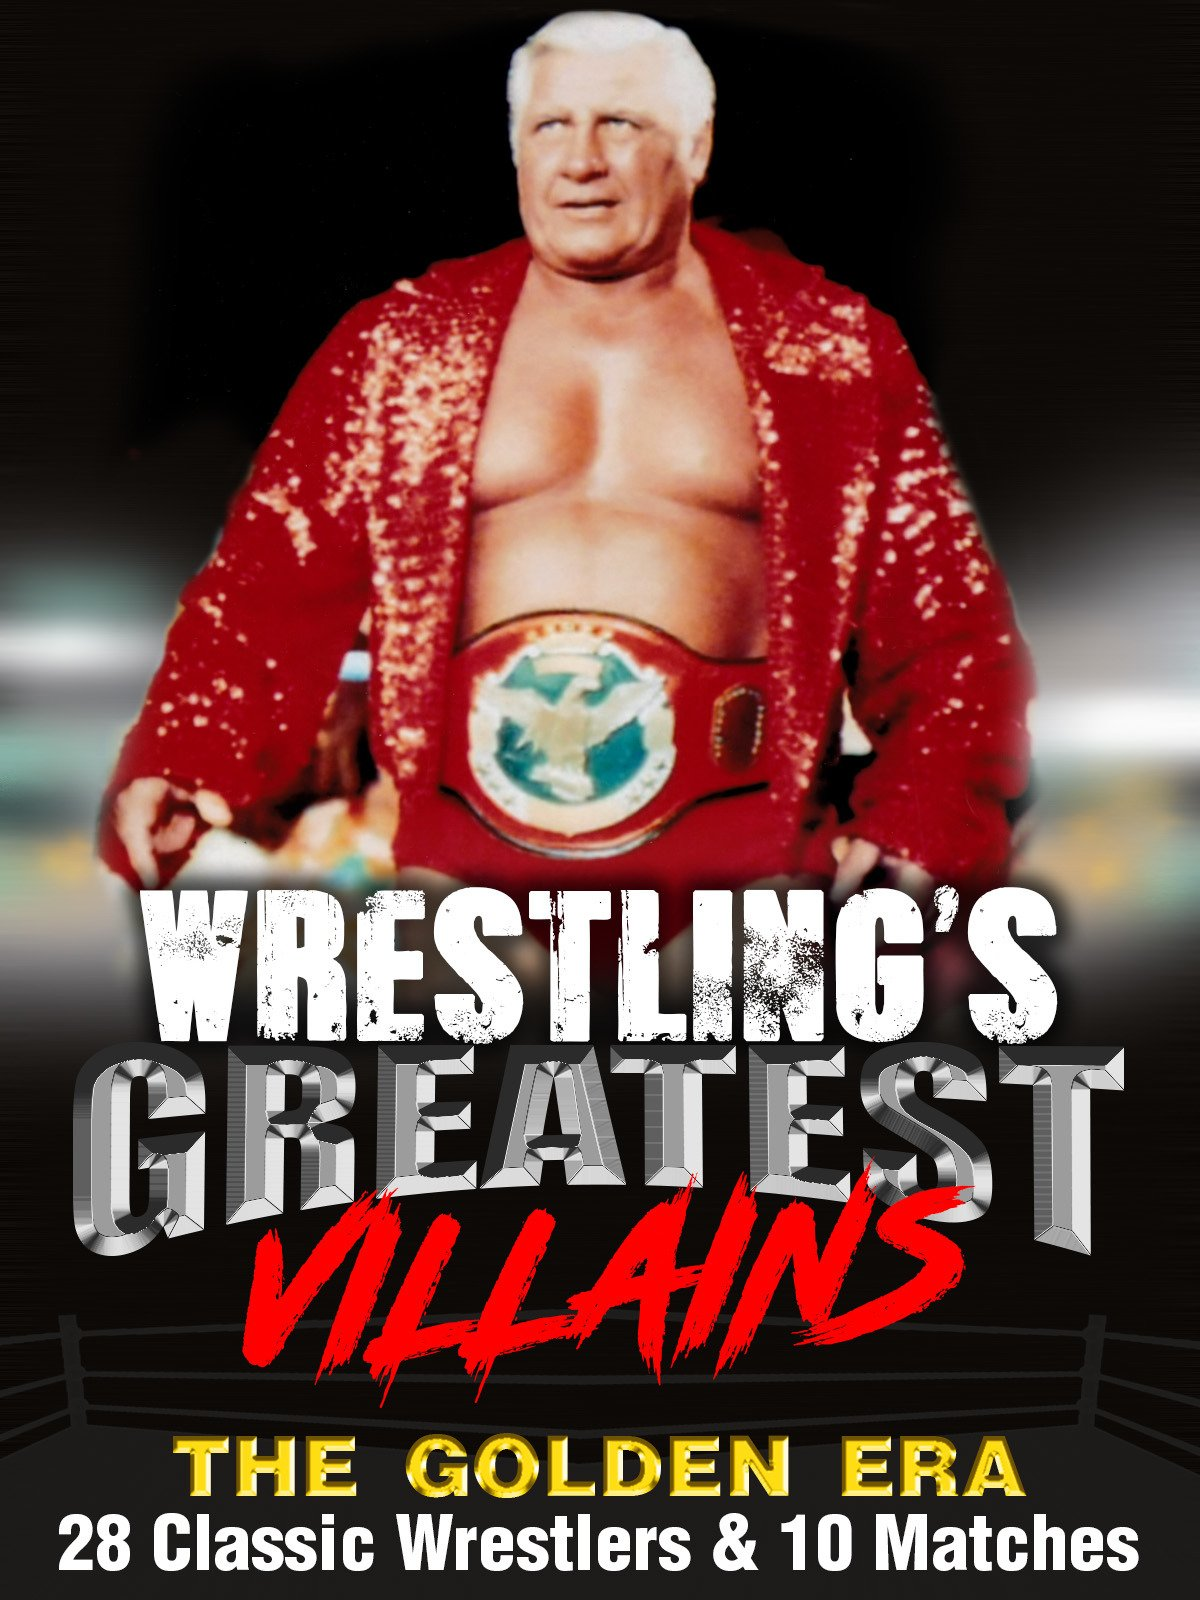 Wrestling's Greatest Villains, The Golden Era: 28 Classic Wrestlers & 10 Matches on Amazon Prime Video UK